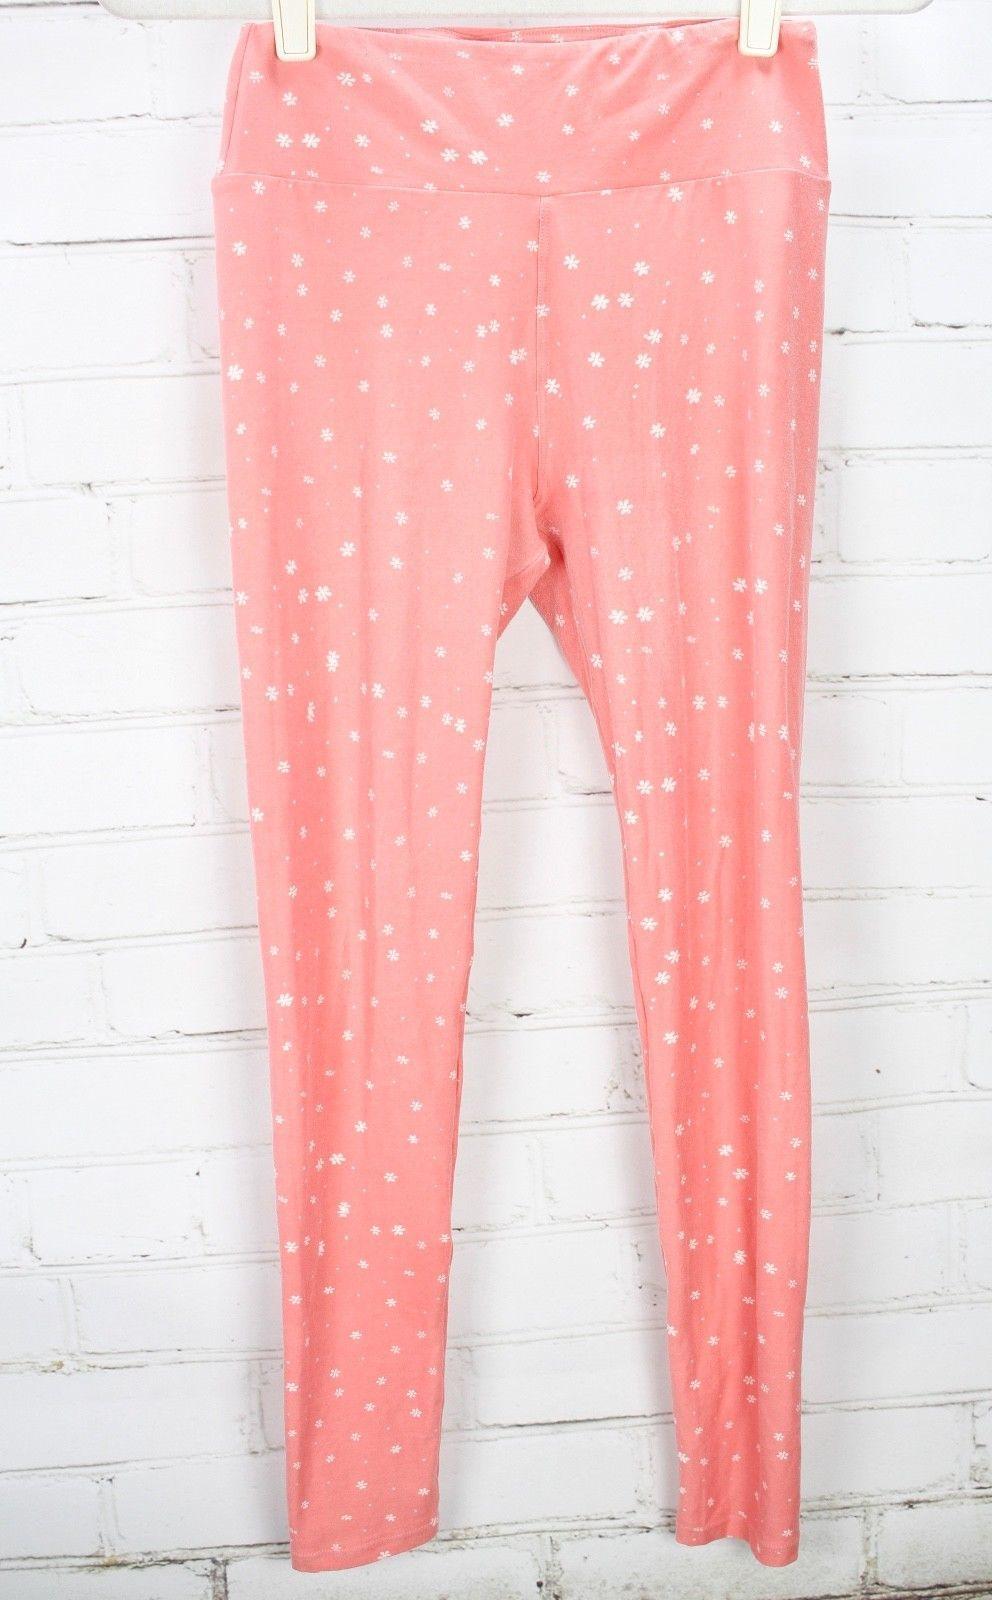 LULAROE Leggings Pink Floral Print OS One Size - Lot of 2 image 7